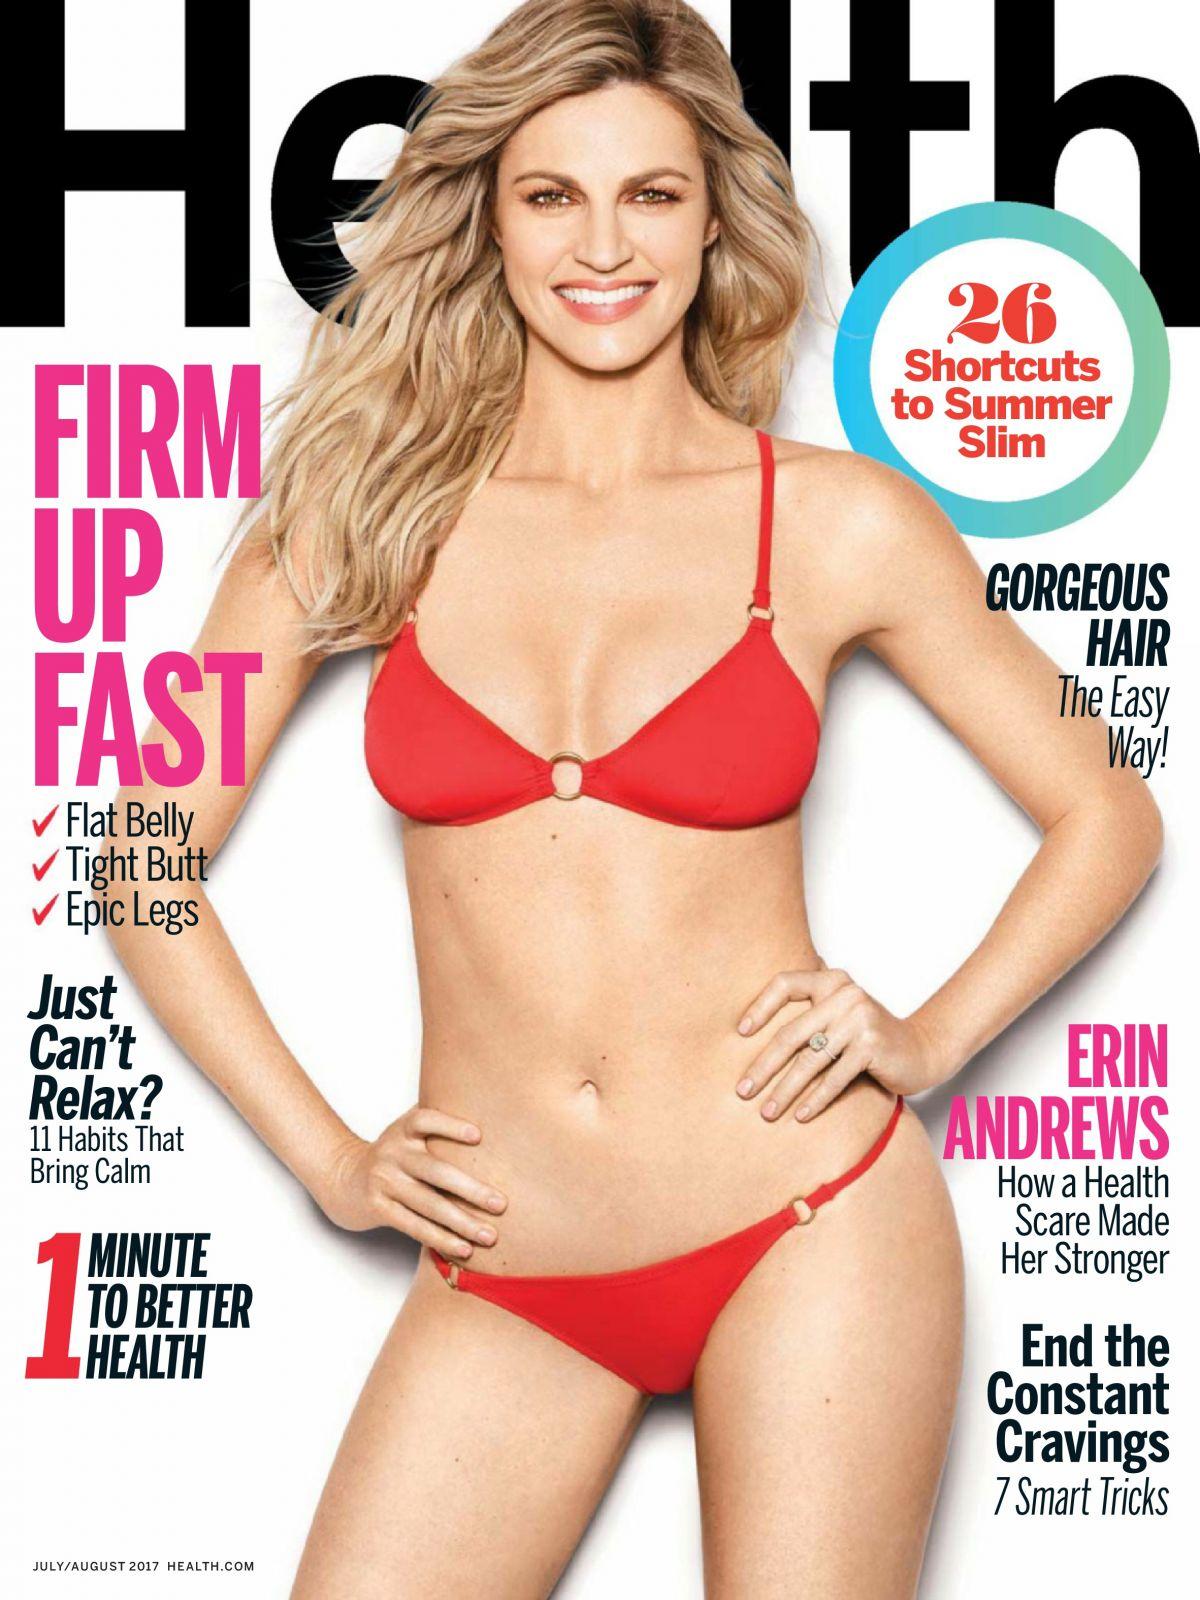 ERIN ANDREWS in Health Magazine, July/August 2017